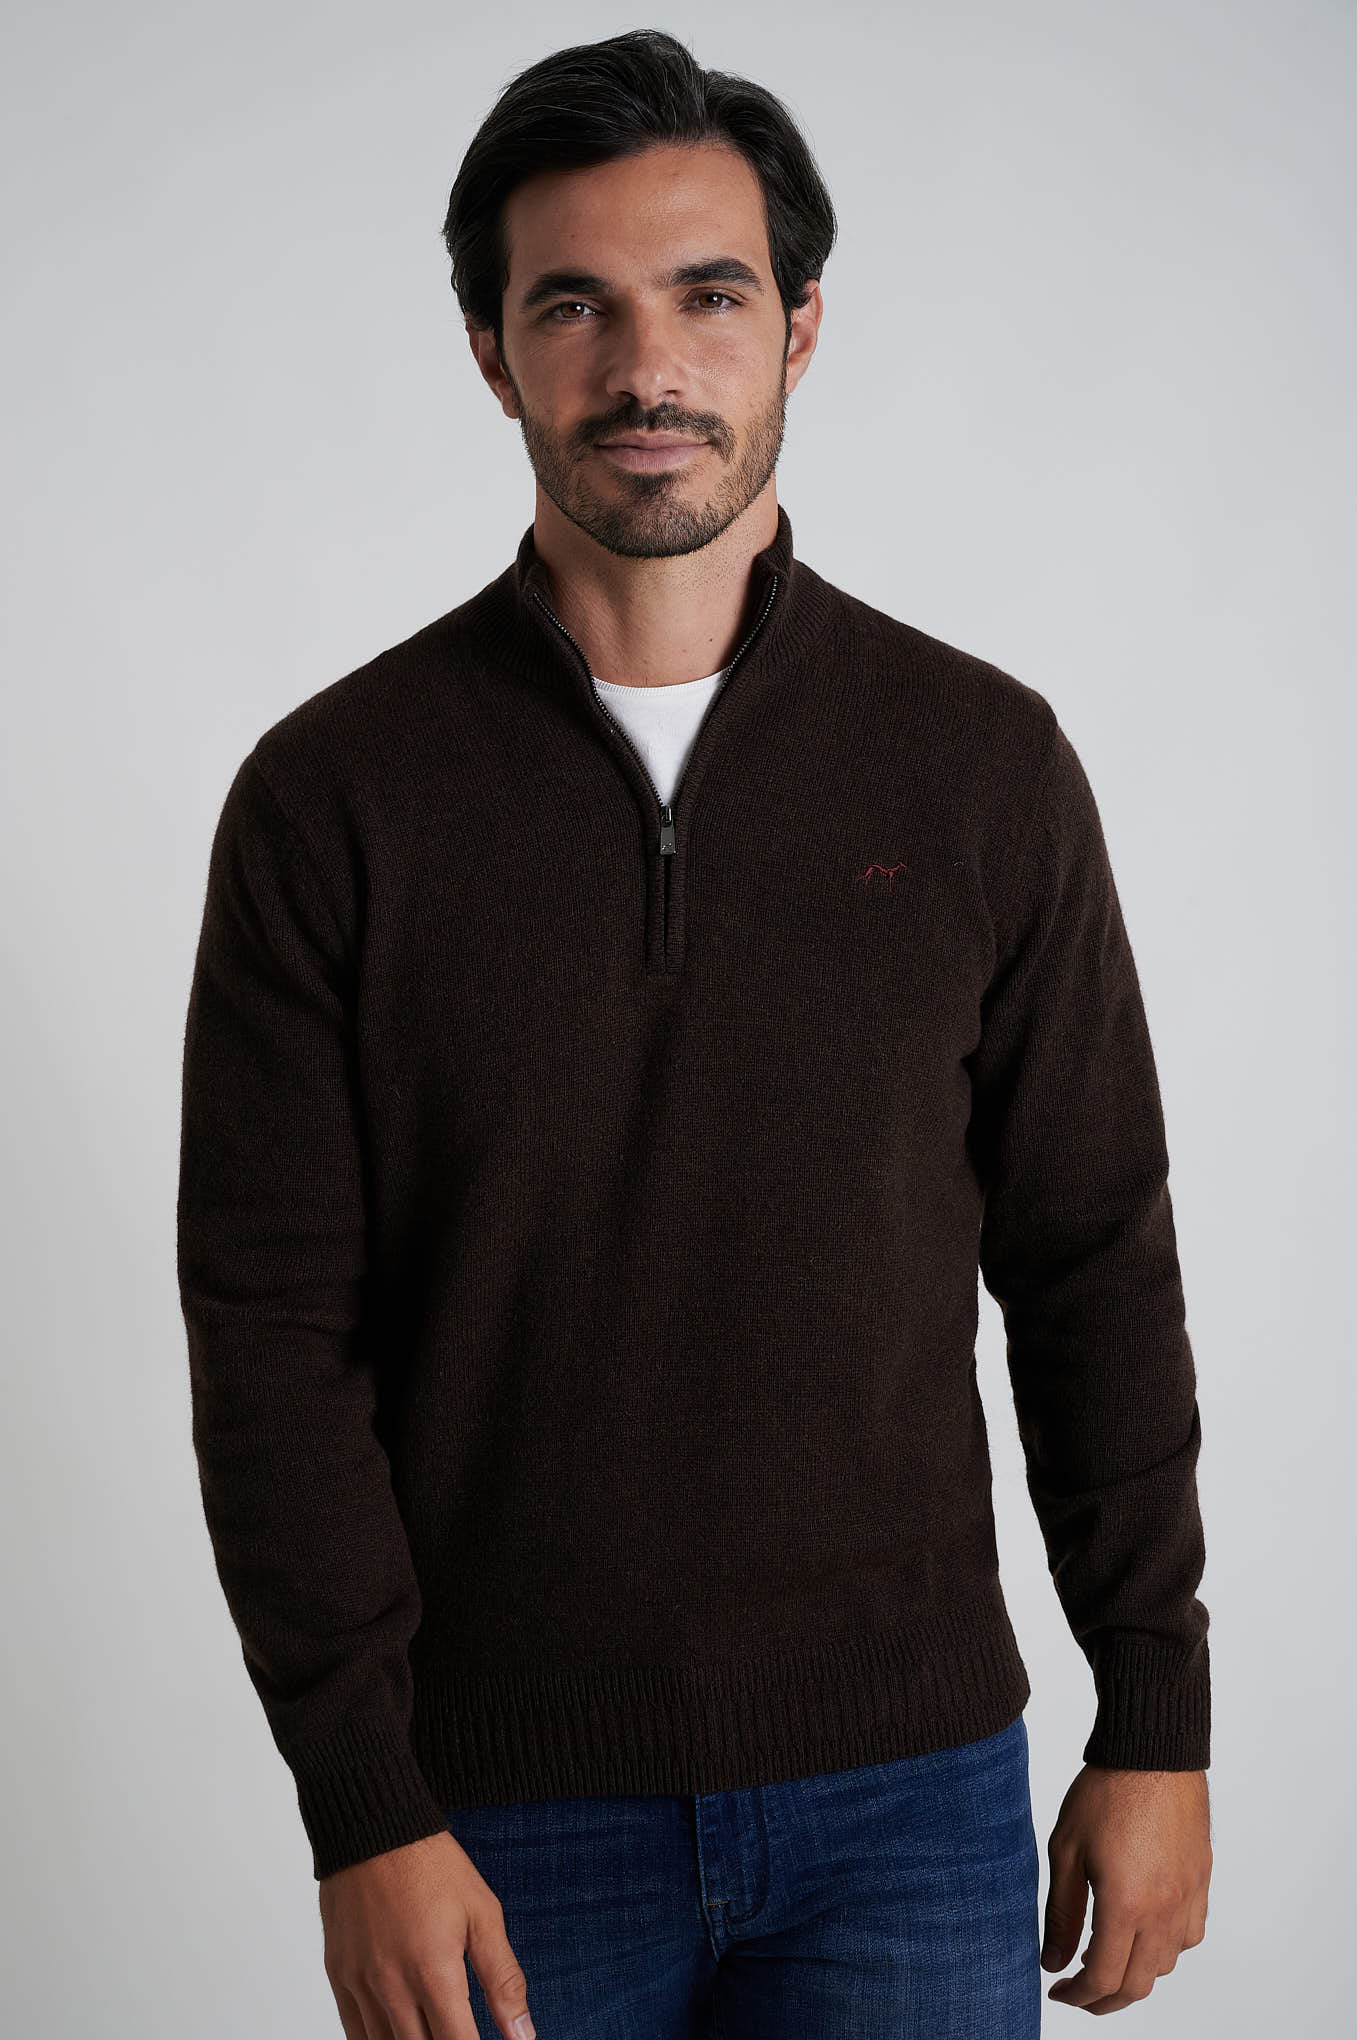 Sweater Chocolate Casual Man